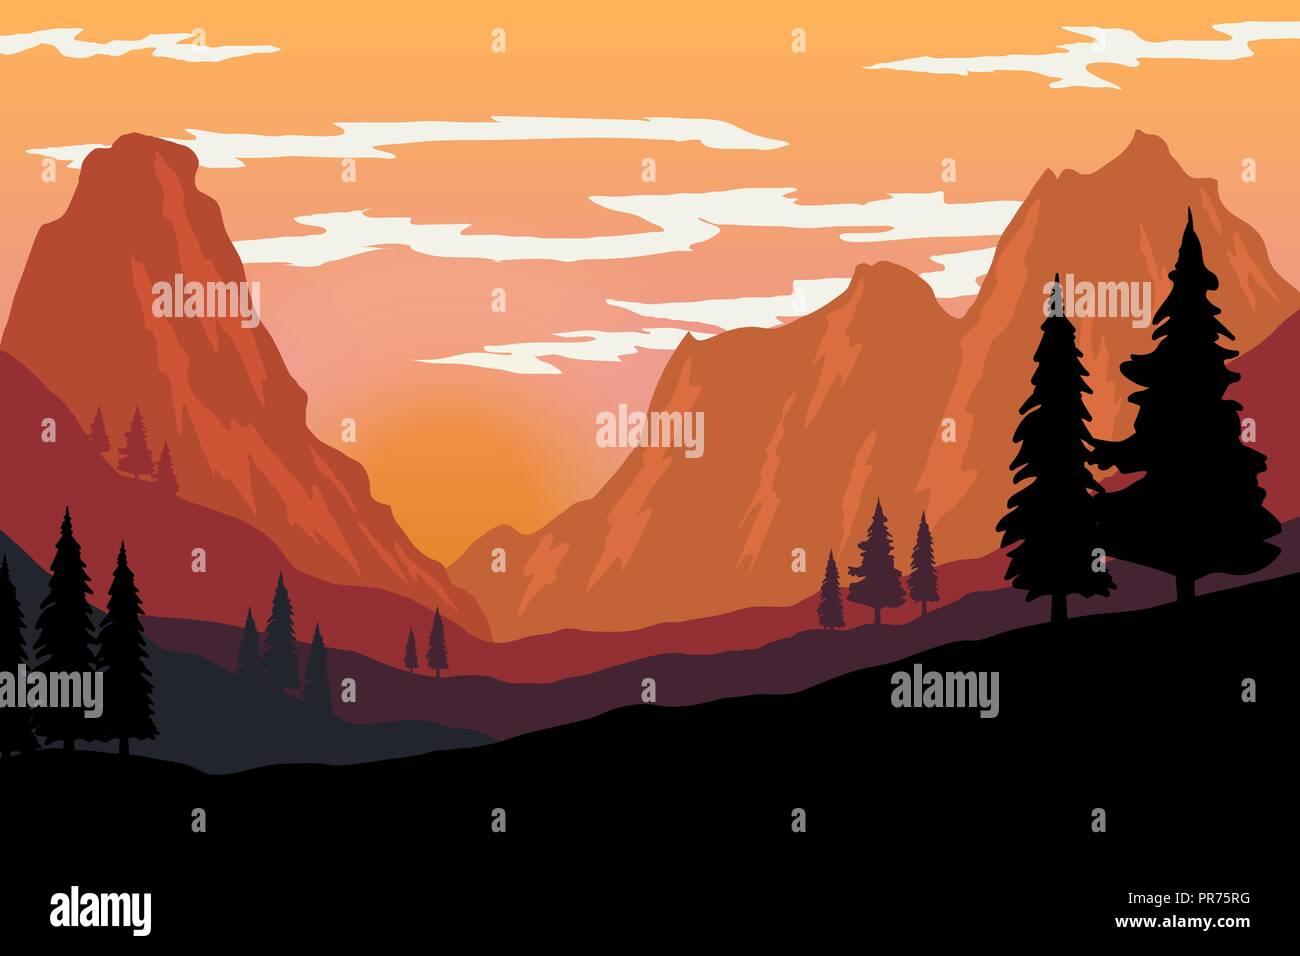 Illustration Of Mountain Landscape In Flat Style Design Element For Poster Flyer Presentation Brochure Vector Image Stock Vector Image Art Alamy,Pink Baby Shower Nail Designs